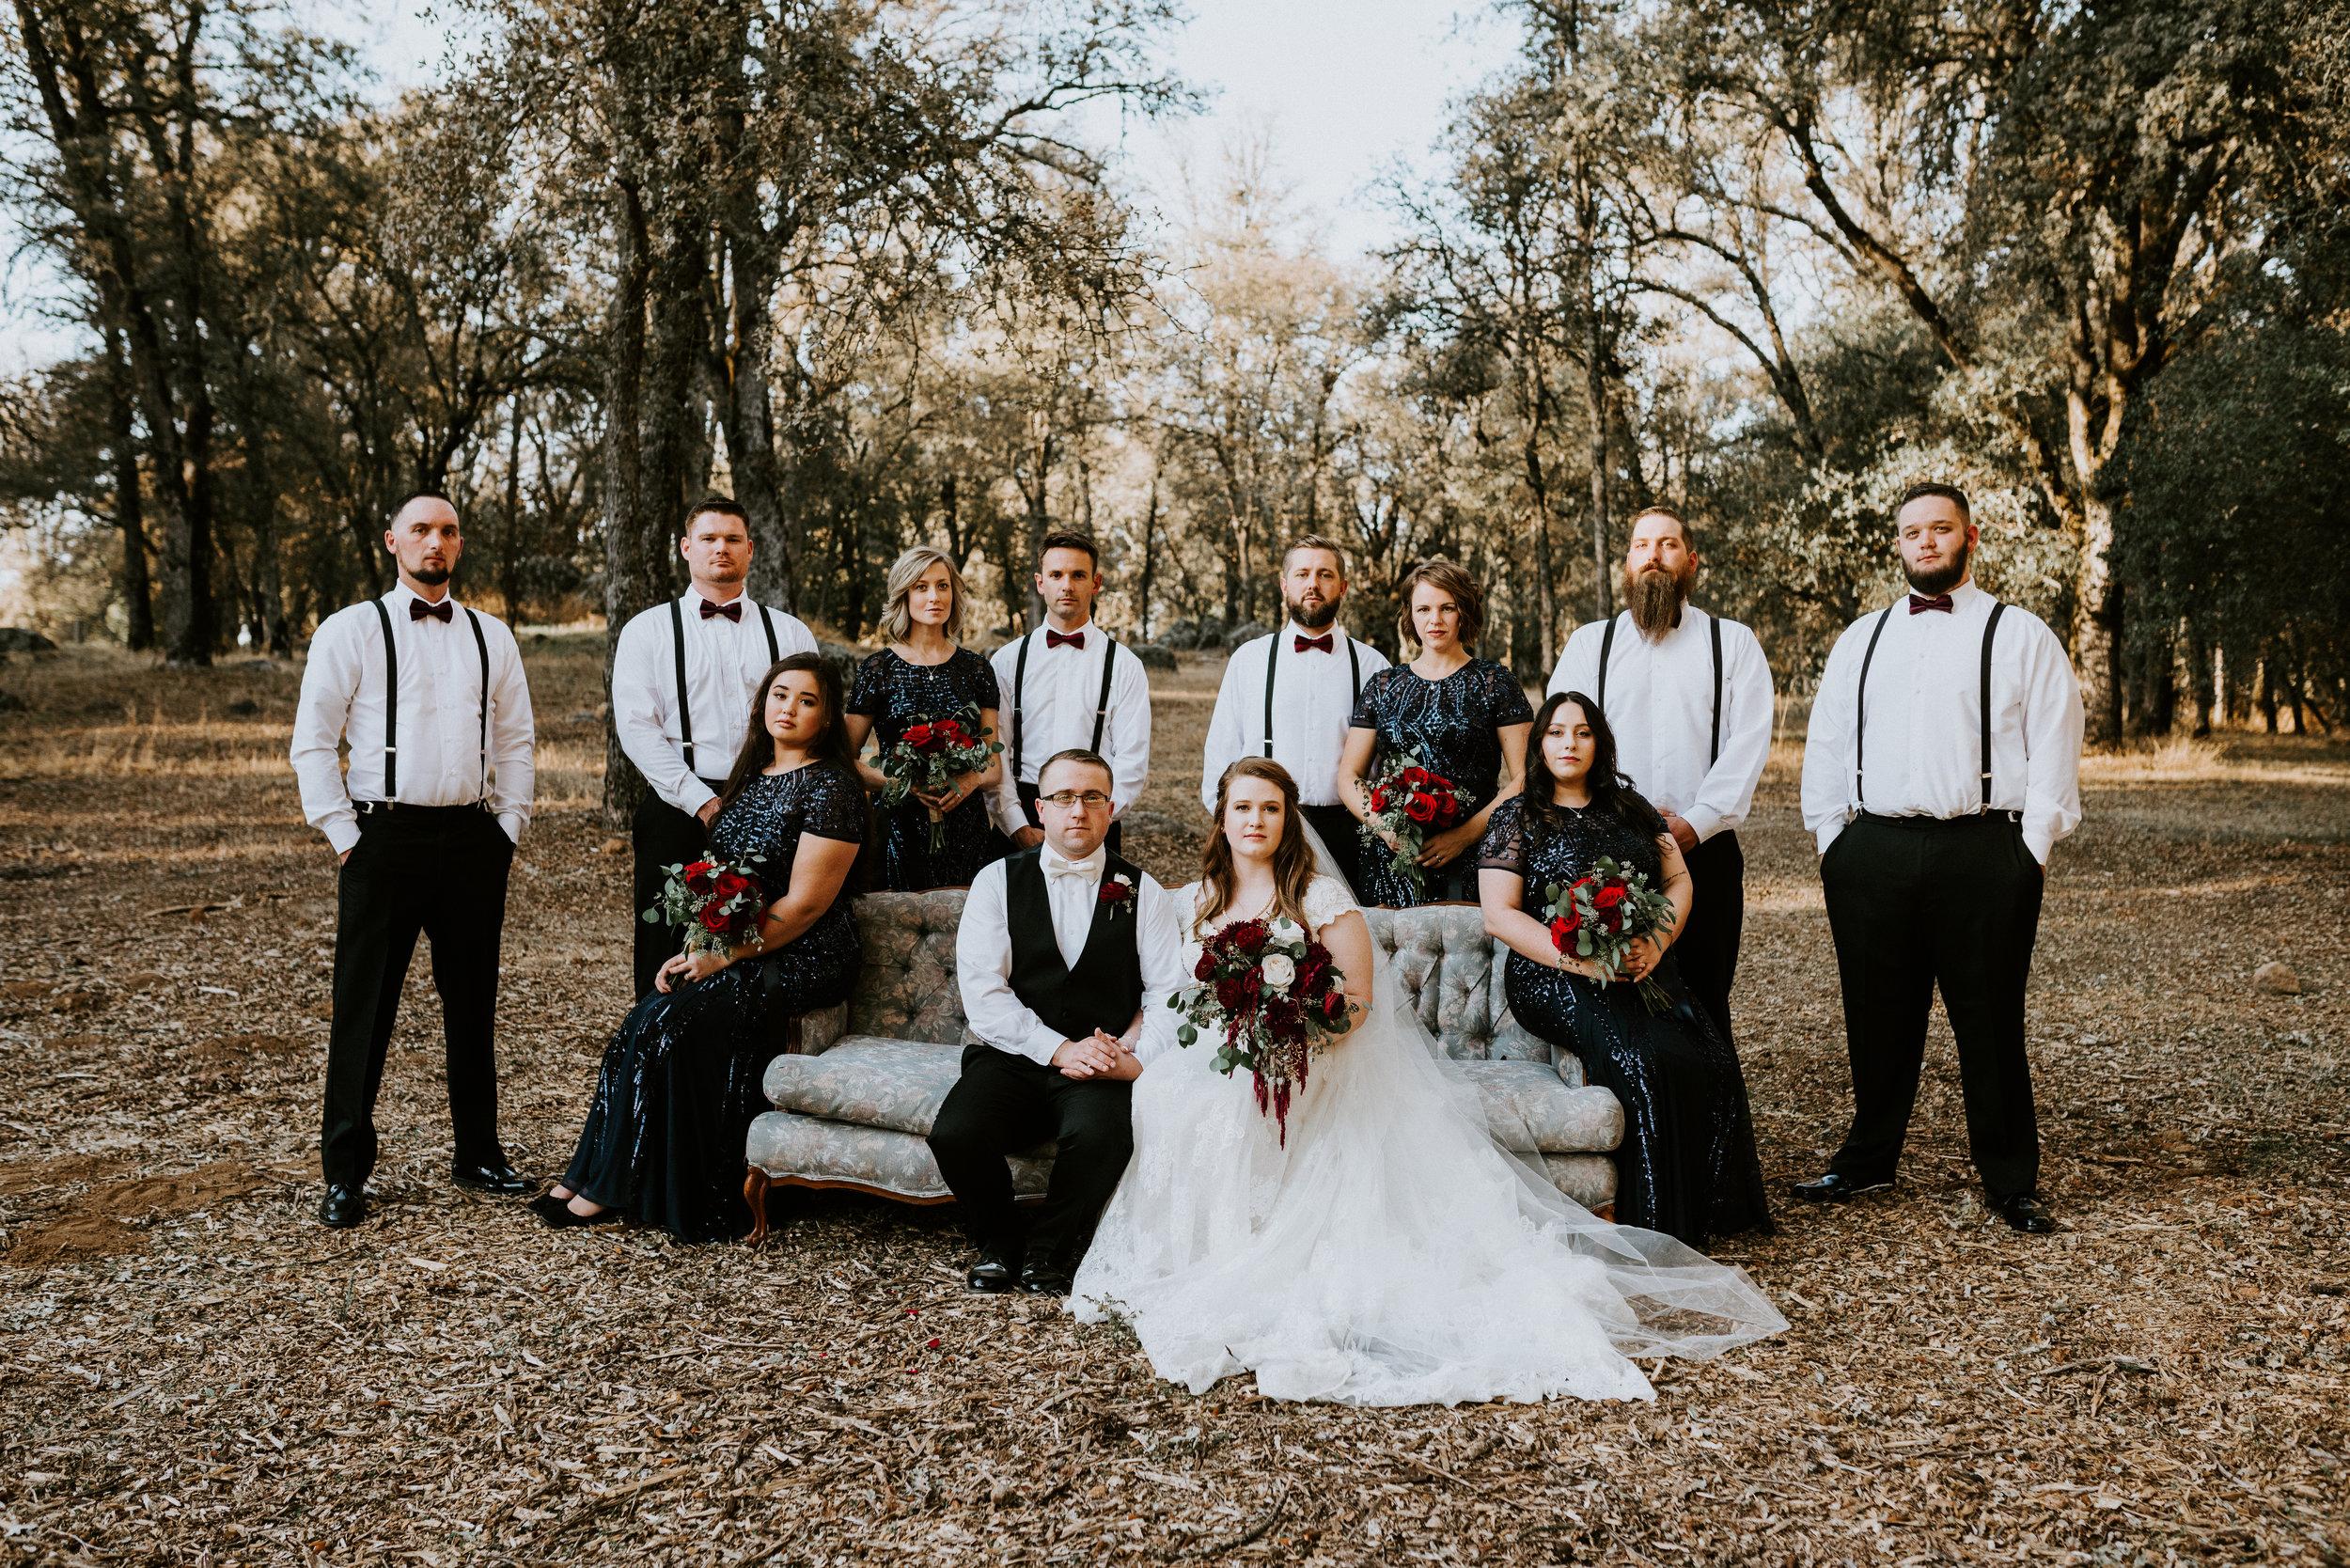 Ashlie-Curtis-Rough-Ready-Vineyard-Wedding-1.jpg